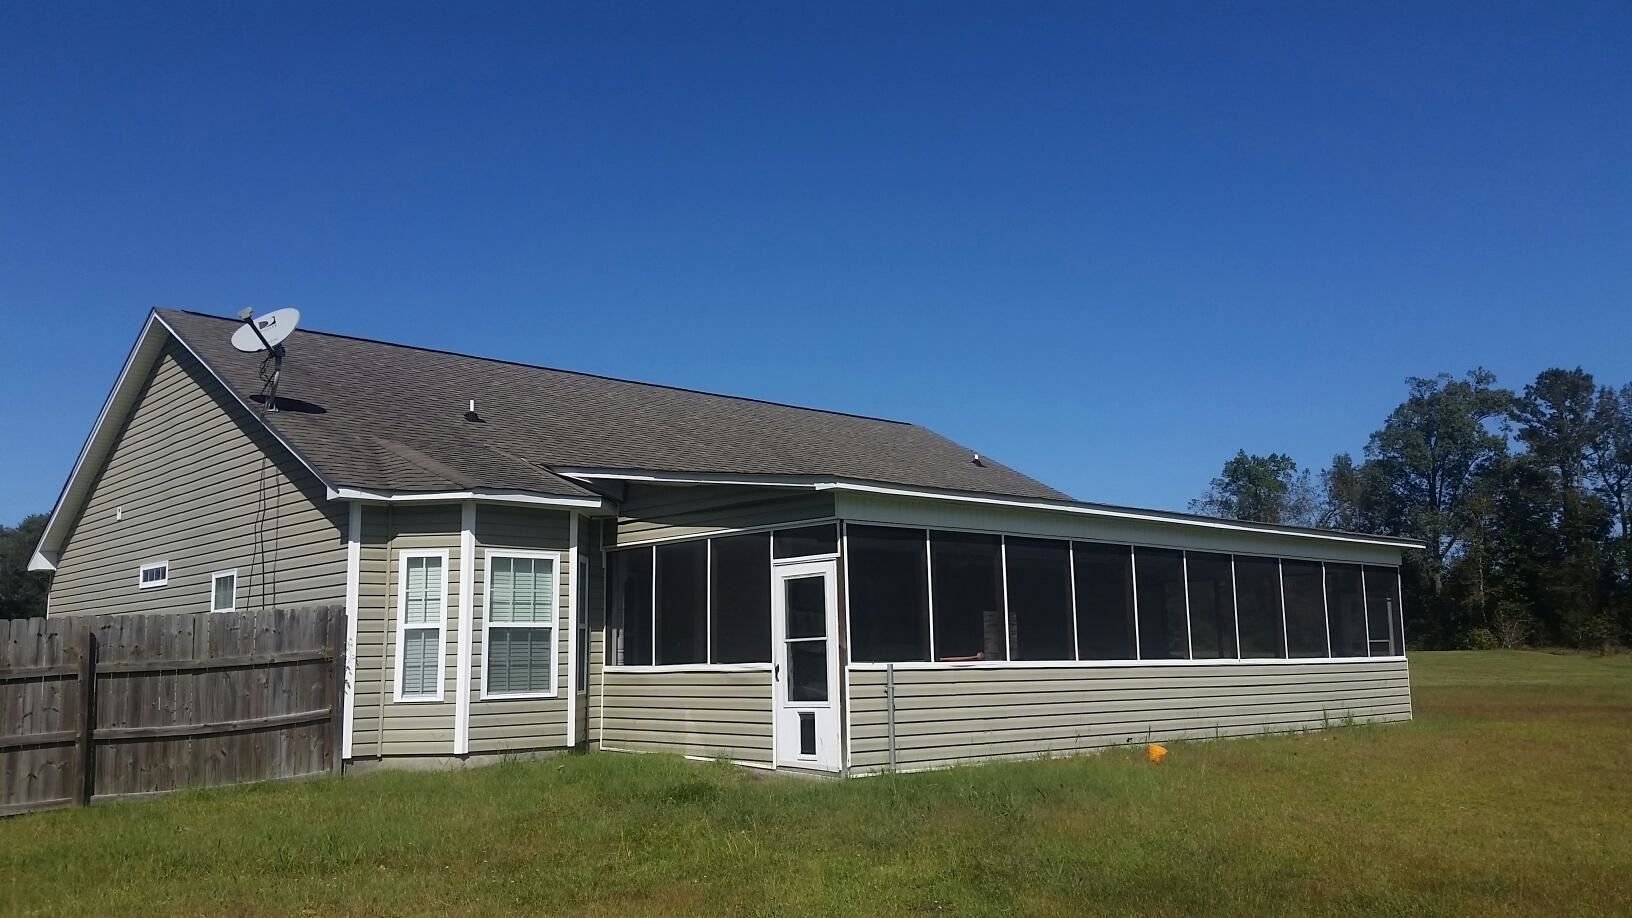 Photo of 143 Spring Leaf Lane, Jacksonville, NC 28540 (MLS # 100284548)